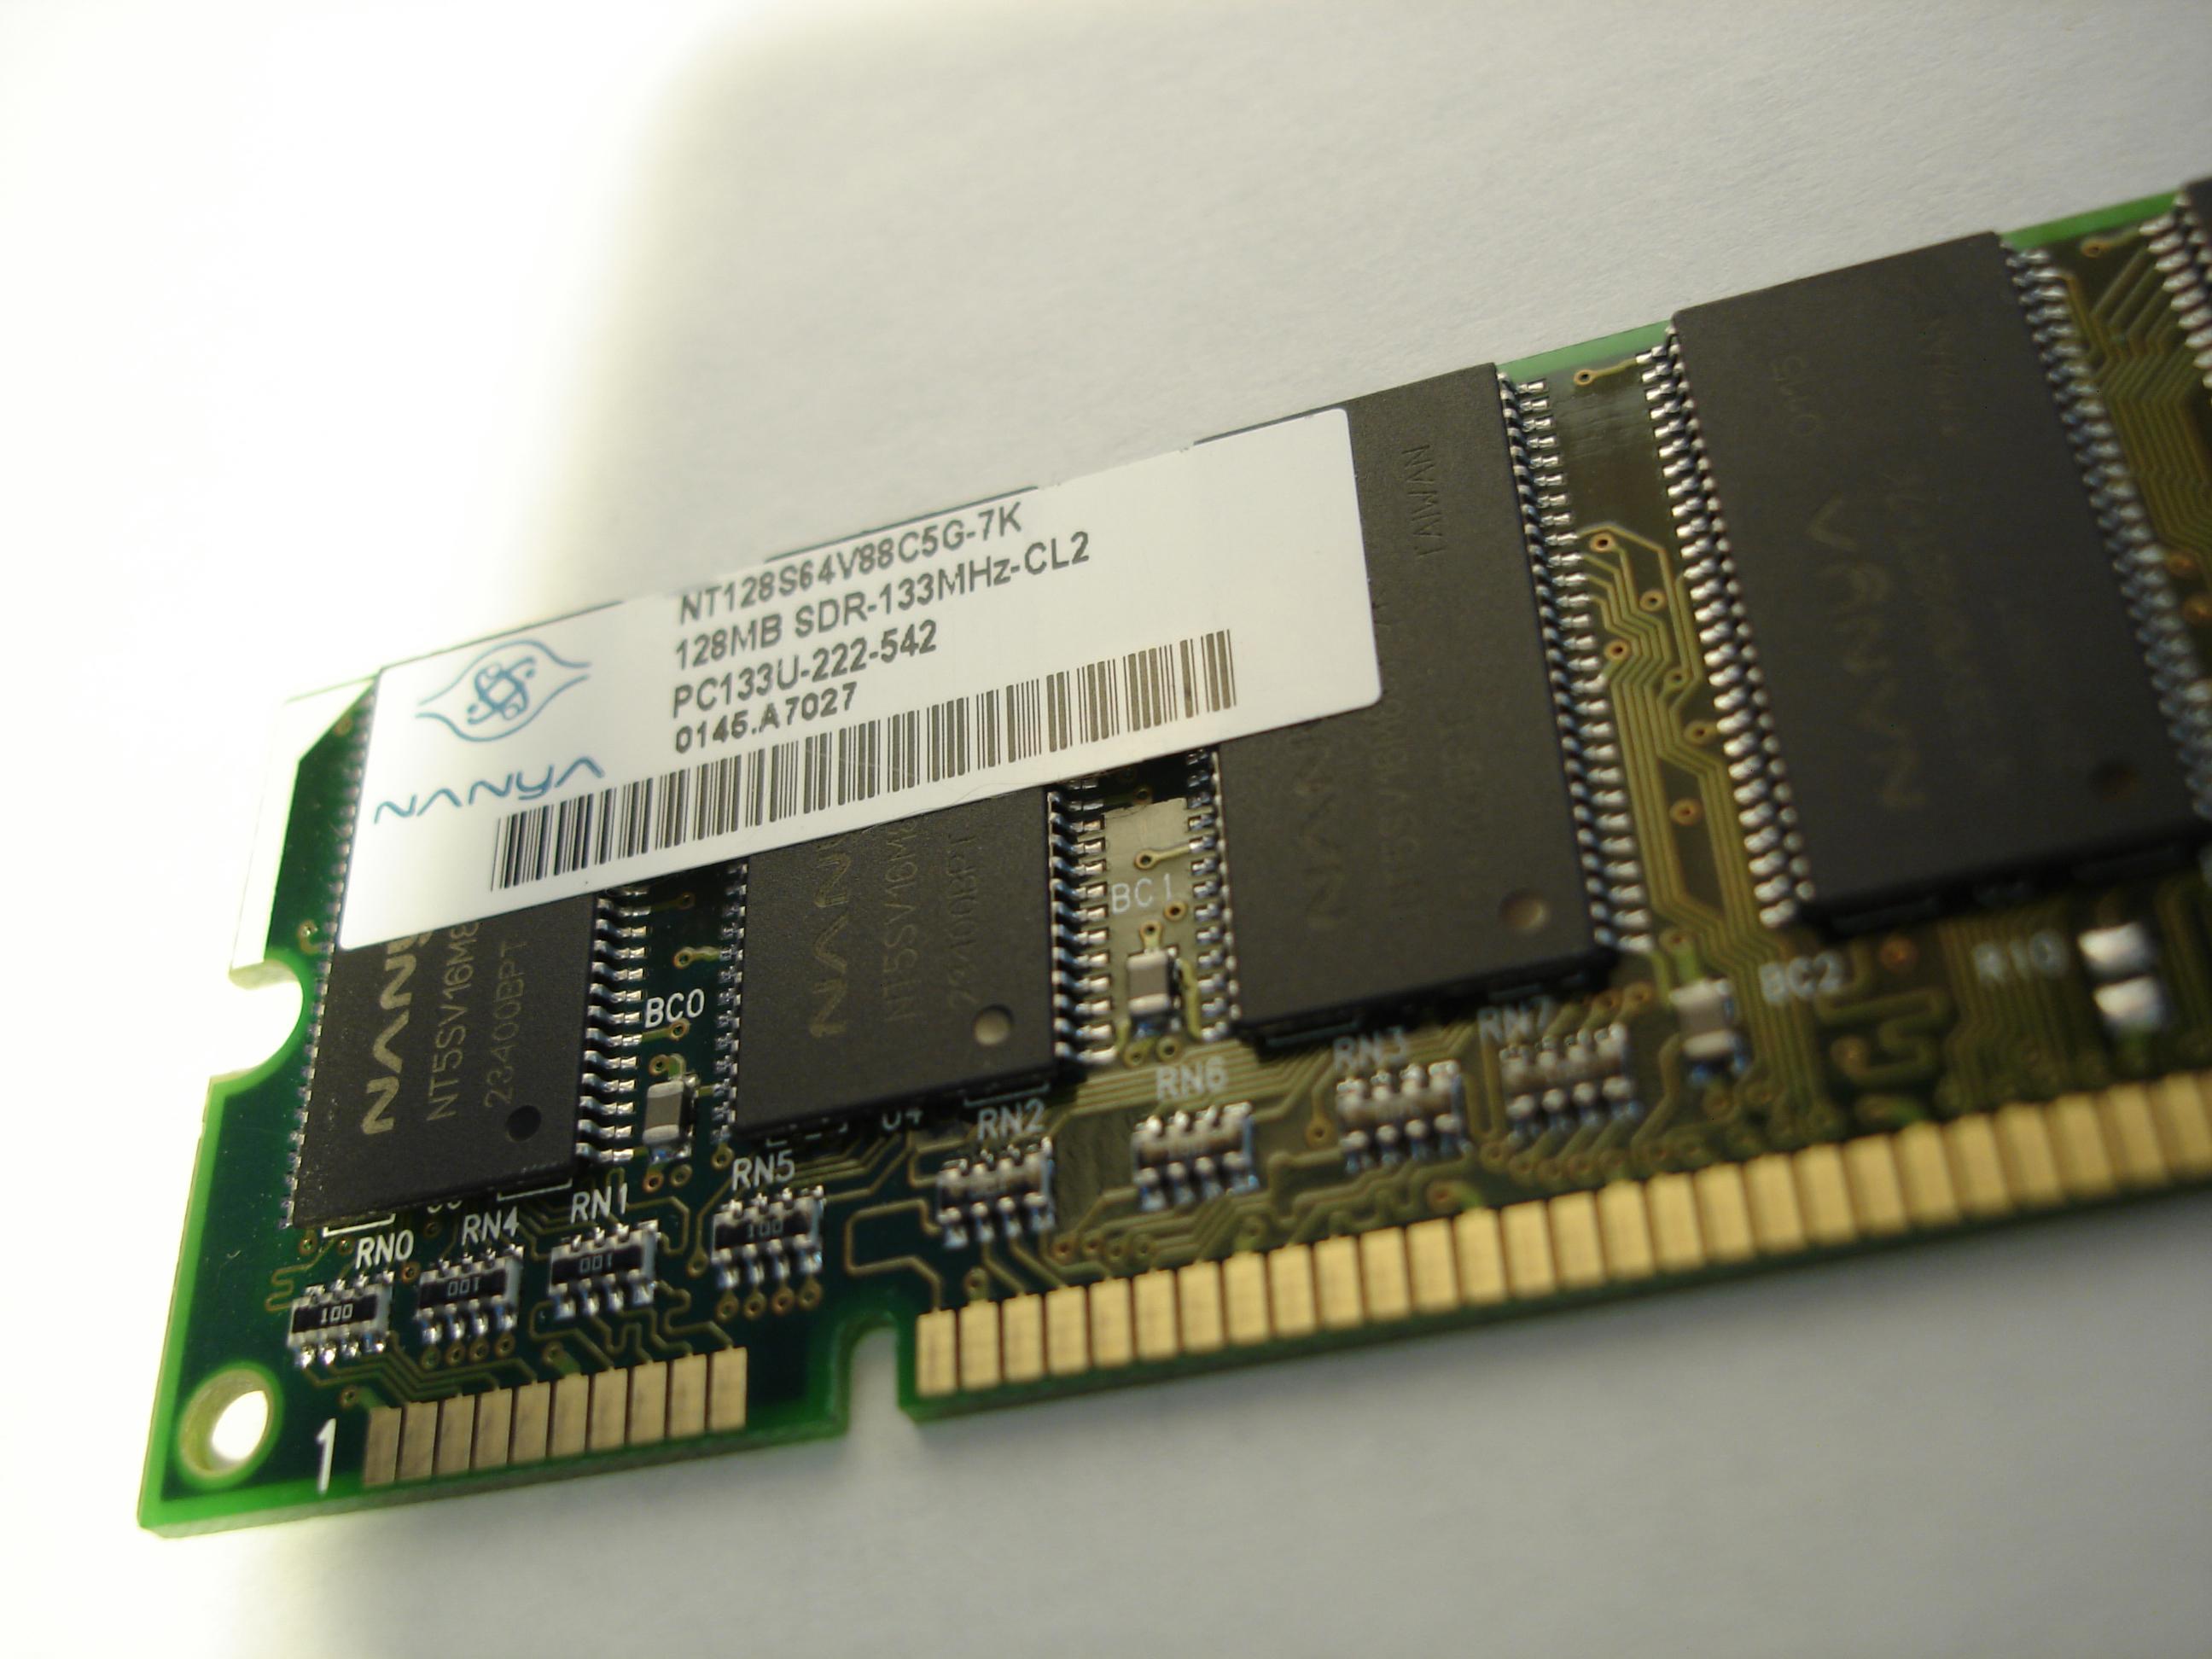 brandon chip memory ram computer pc part ddr ddr2 sdram nanya 128MB